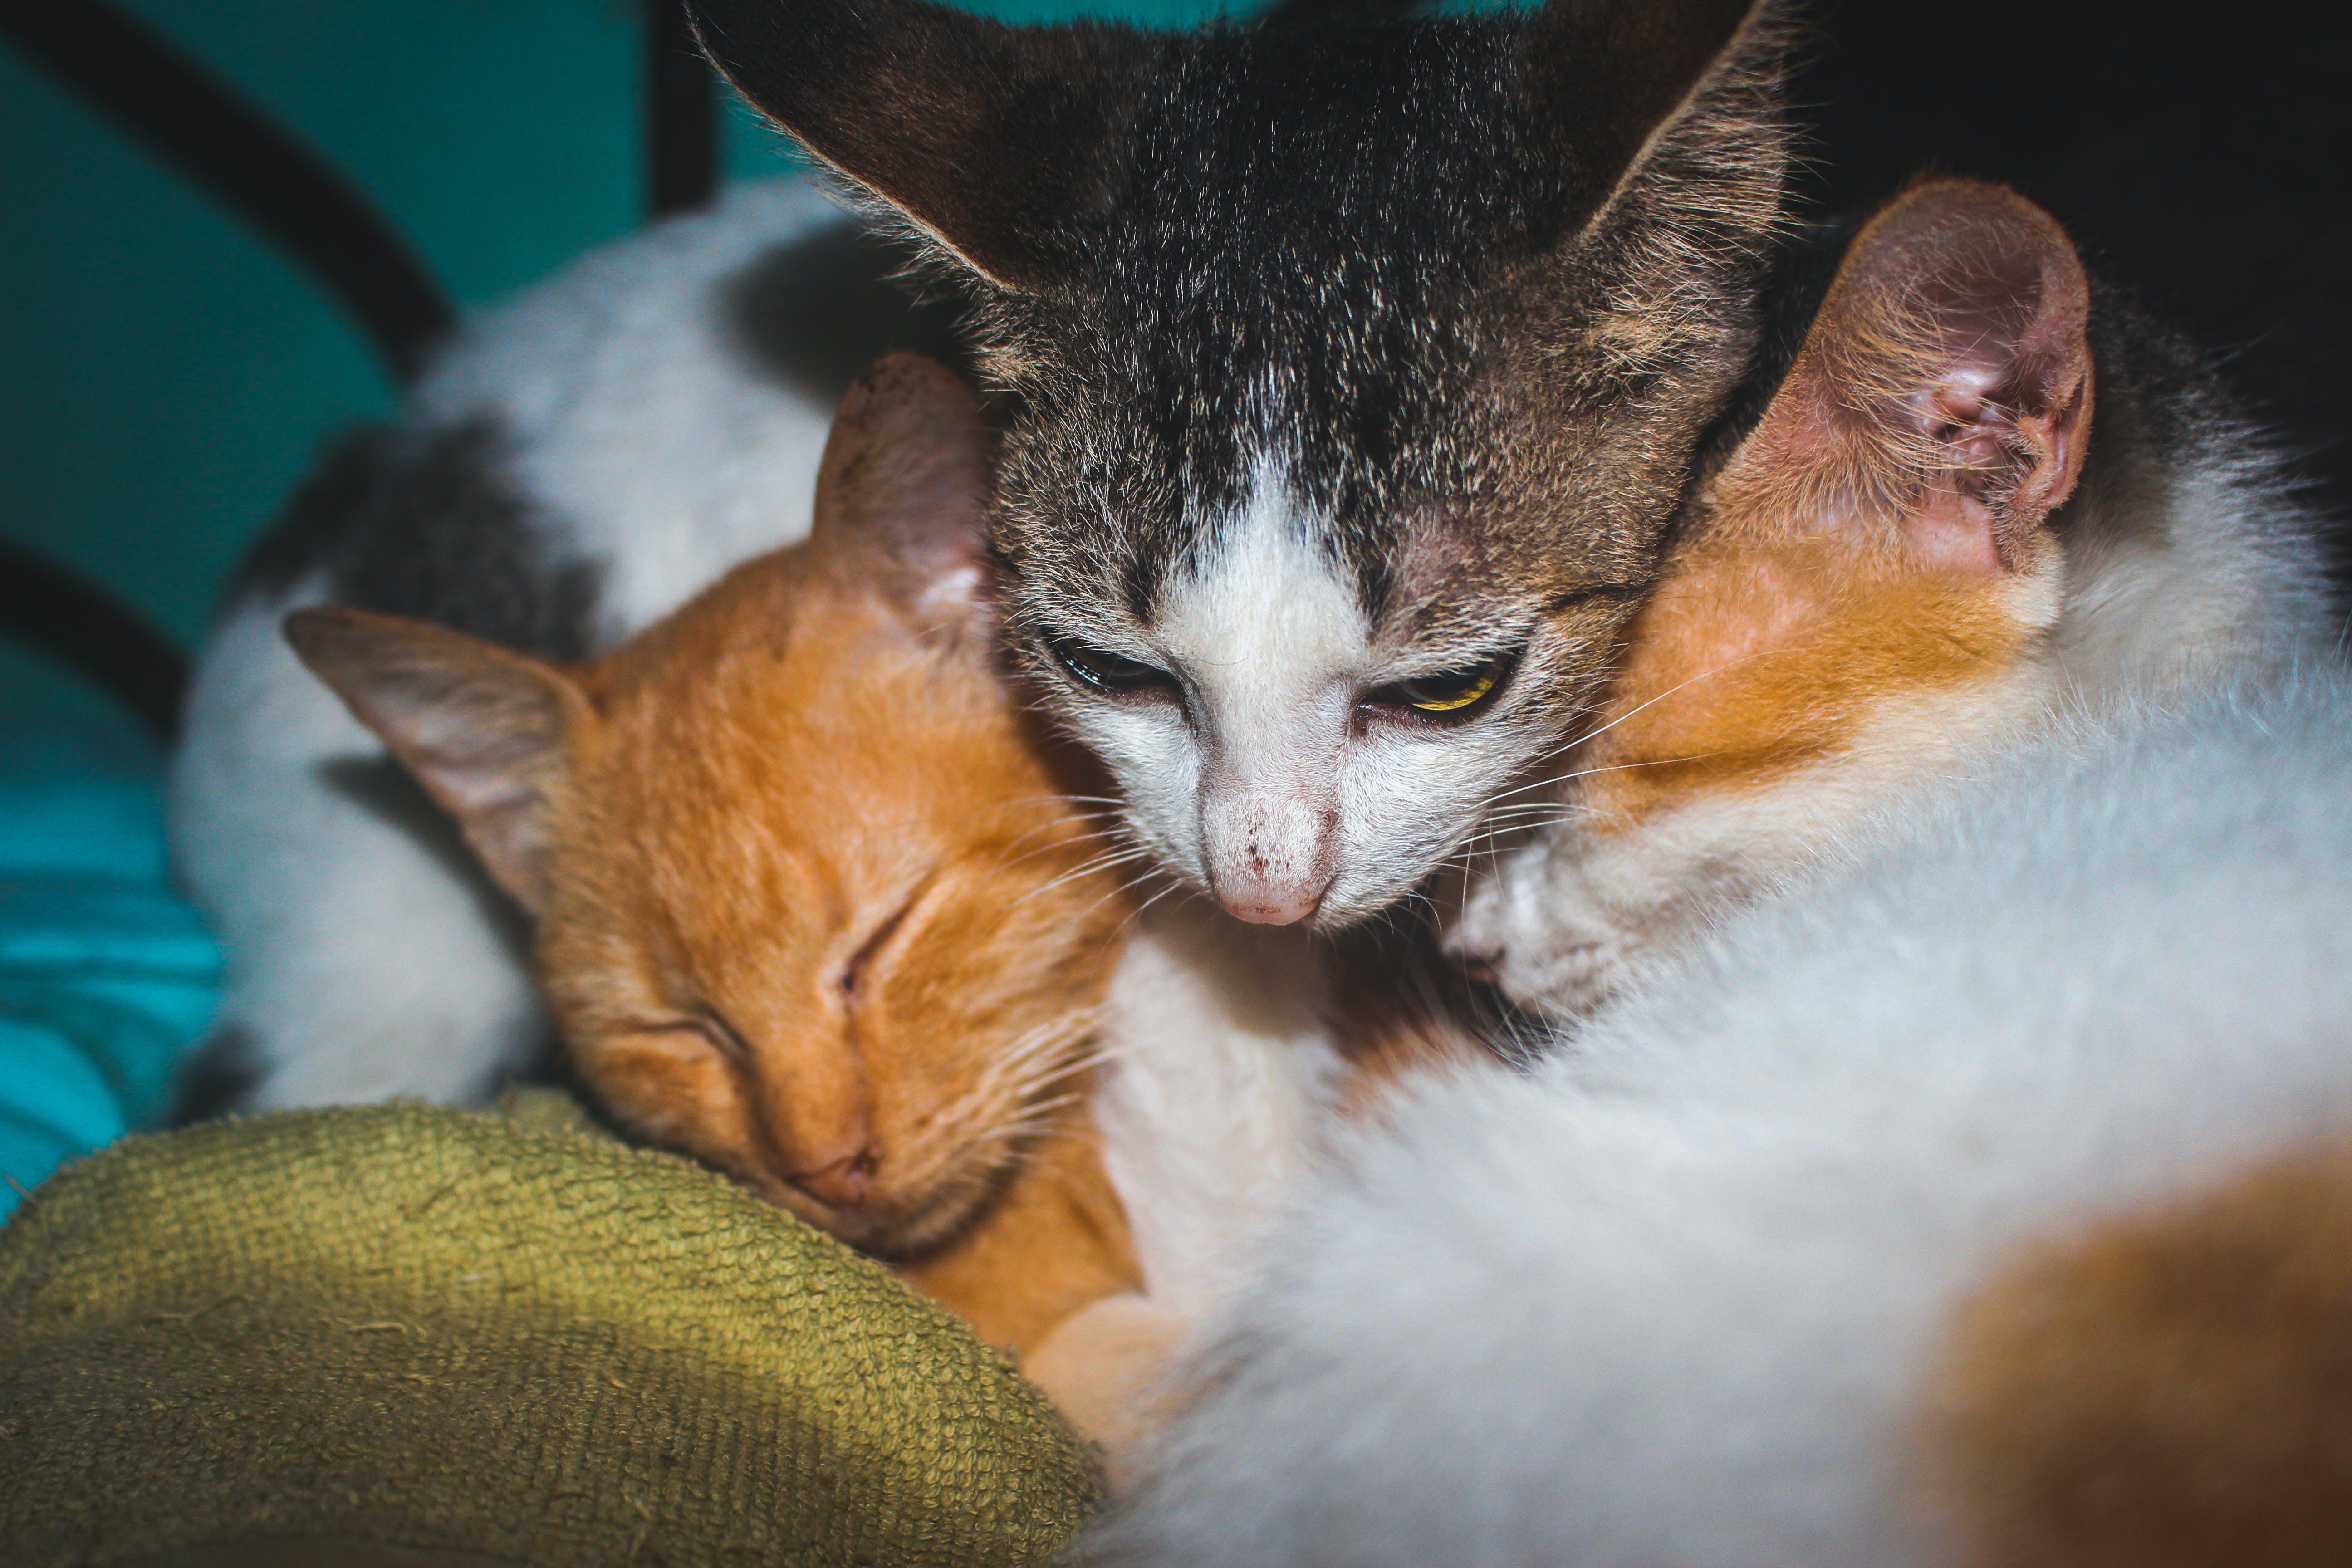 Free stock photo of cat, cat face, cat sleeping, cat's eyes